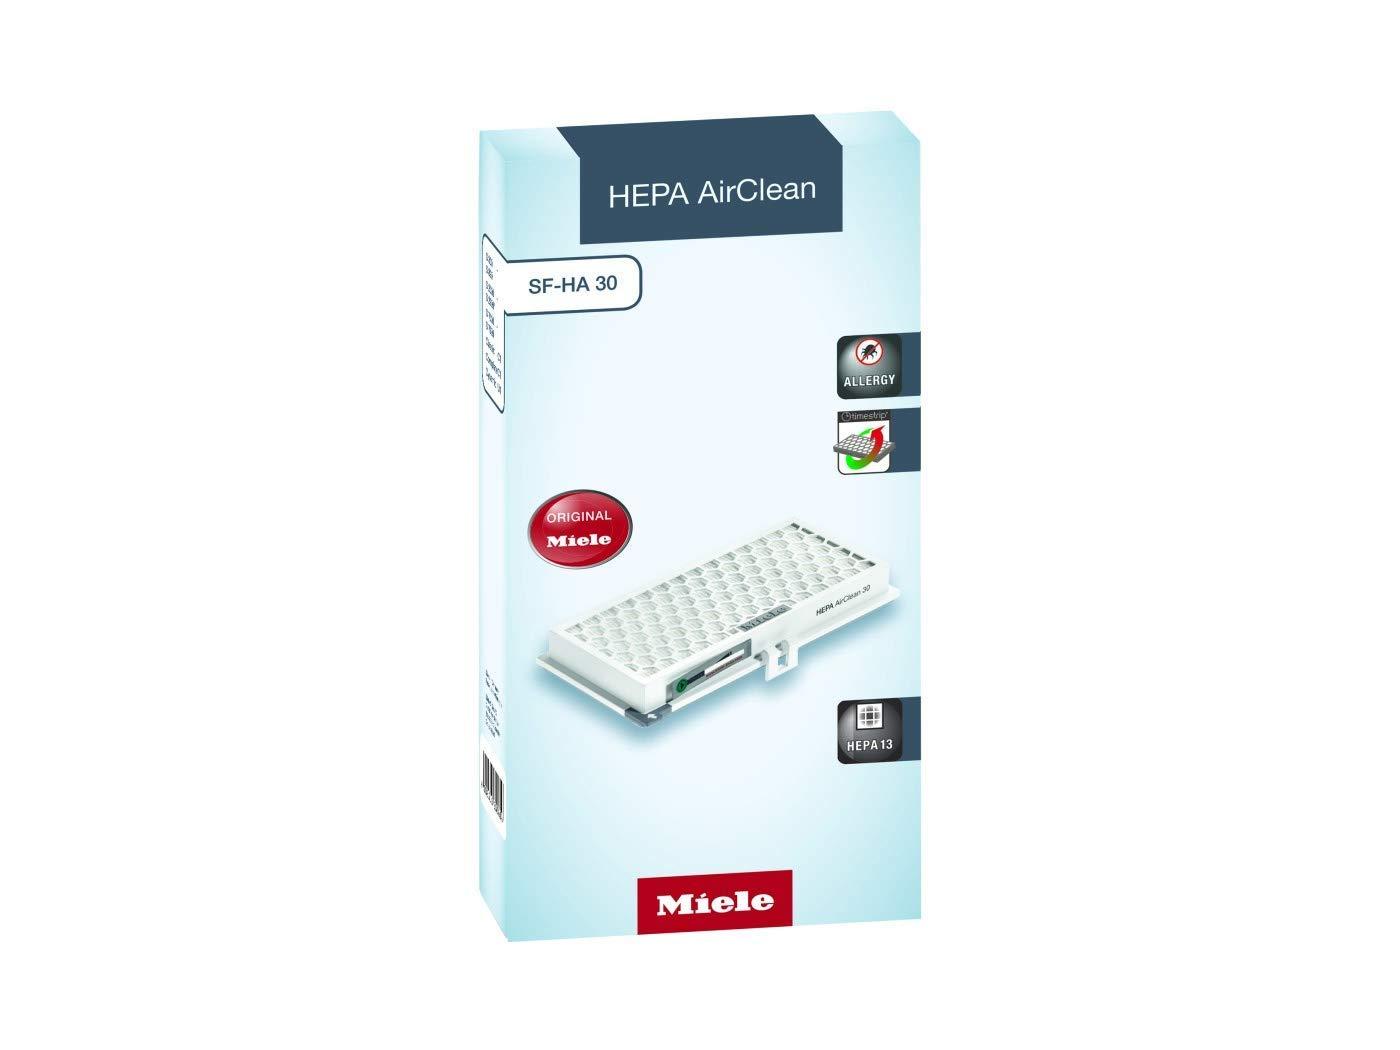 Miele Vacuum Cleaner Active HEPA Filter 315606 SF-HA30 MIE1003 [MIE1003] (Renewed) by Miele